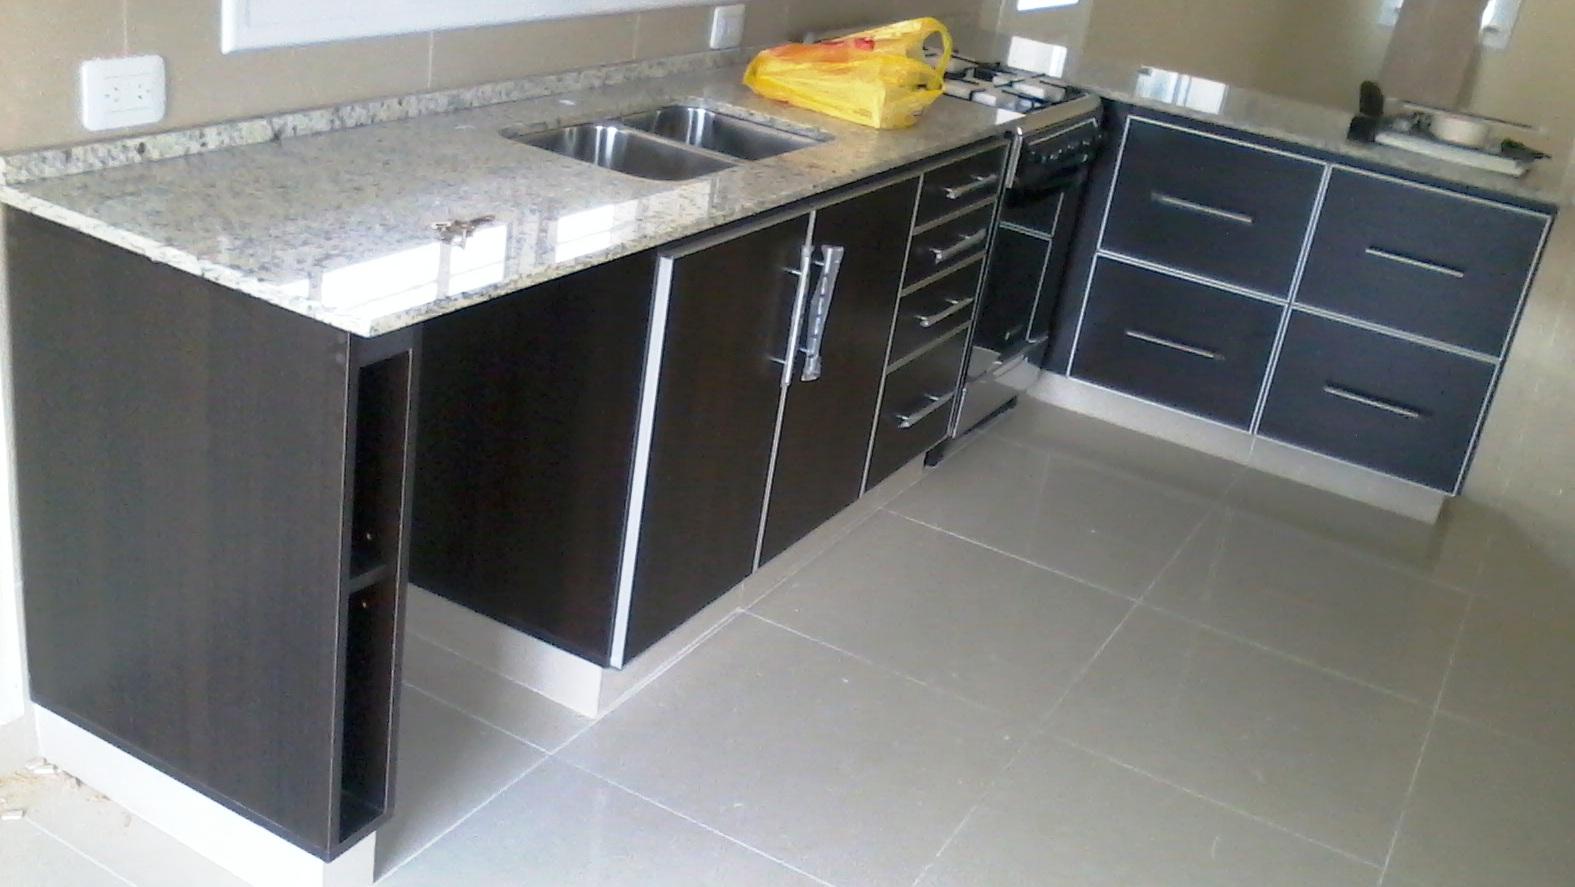 Limpiar Muebles De Cocina De Formica Mate Muebles Cocina Formica  ~ Limpiar Muebles De Cocina De Formica Mate